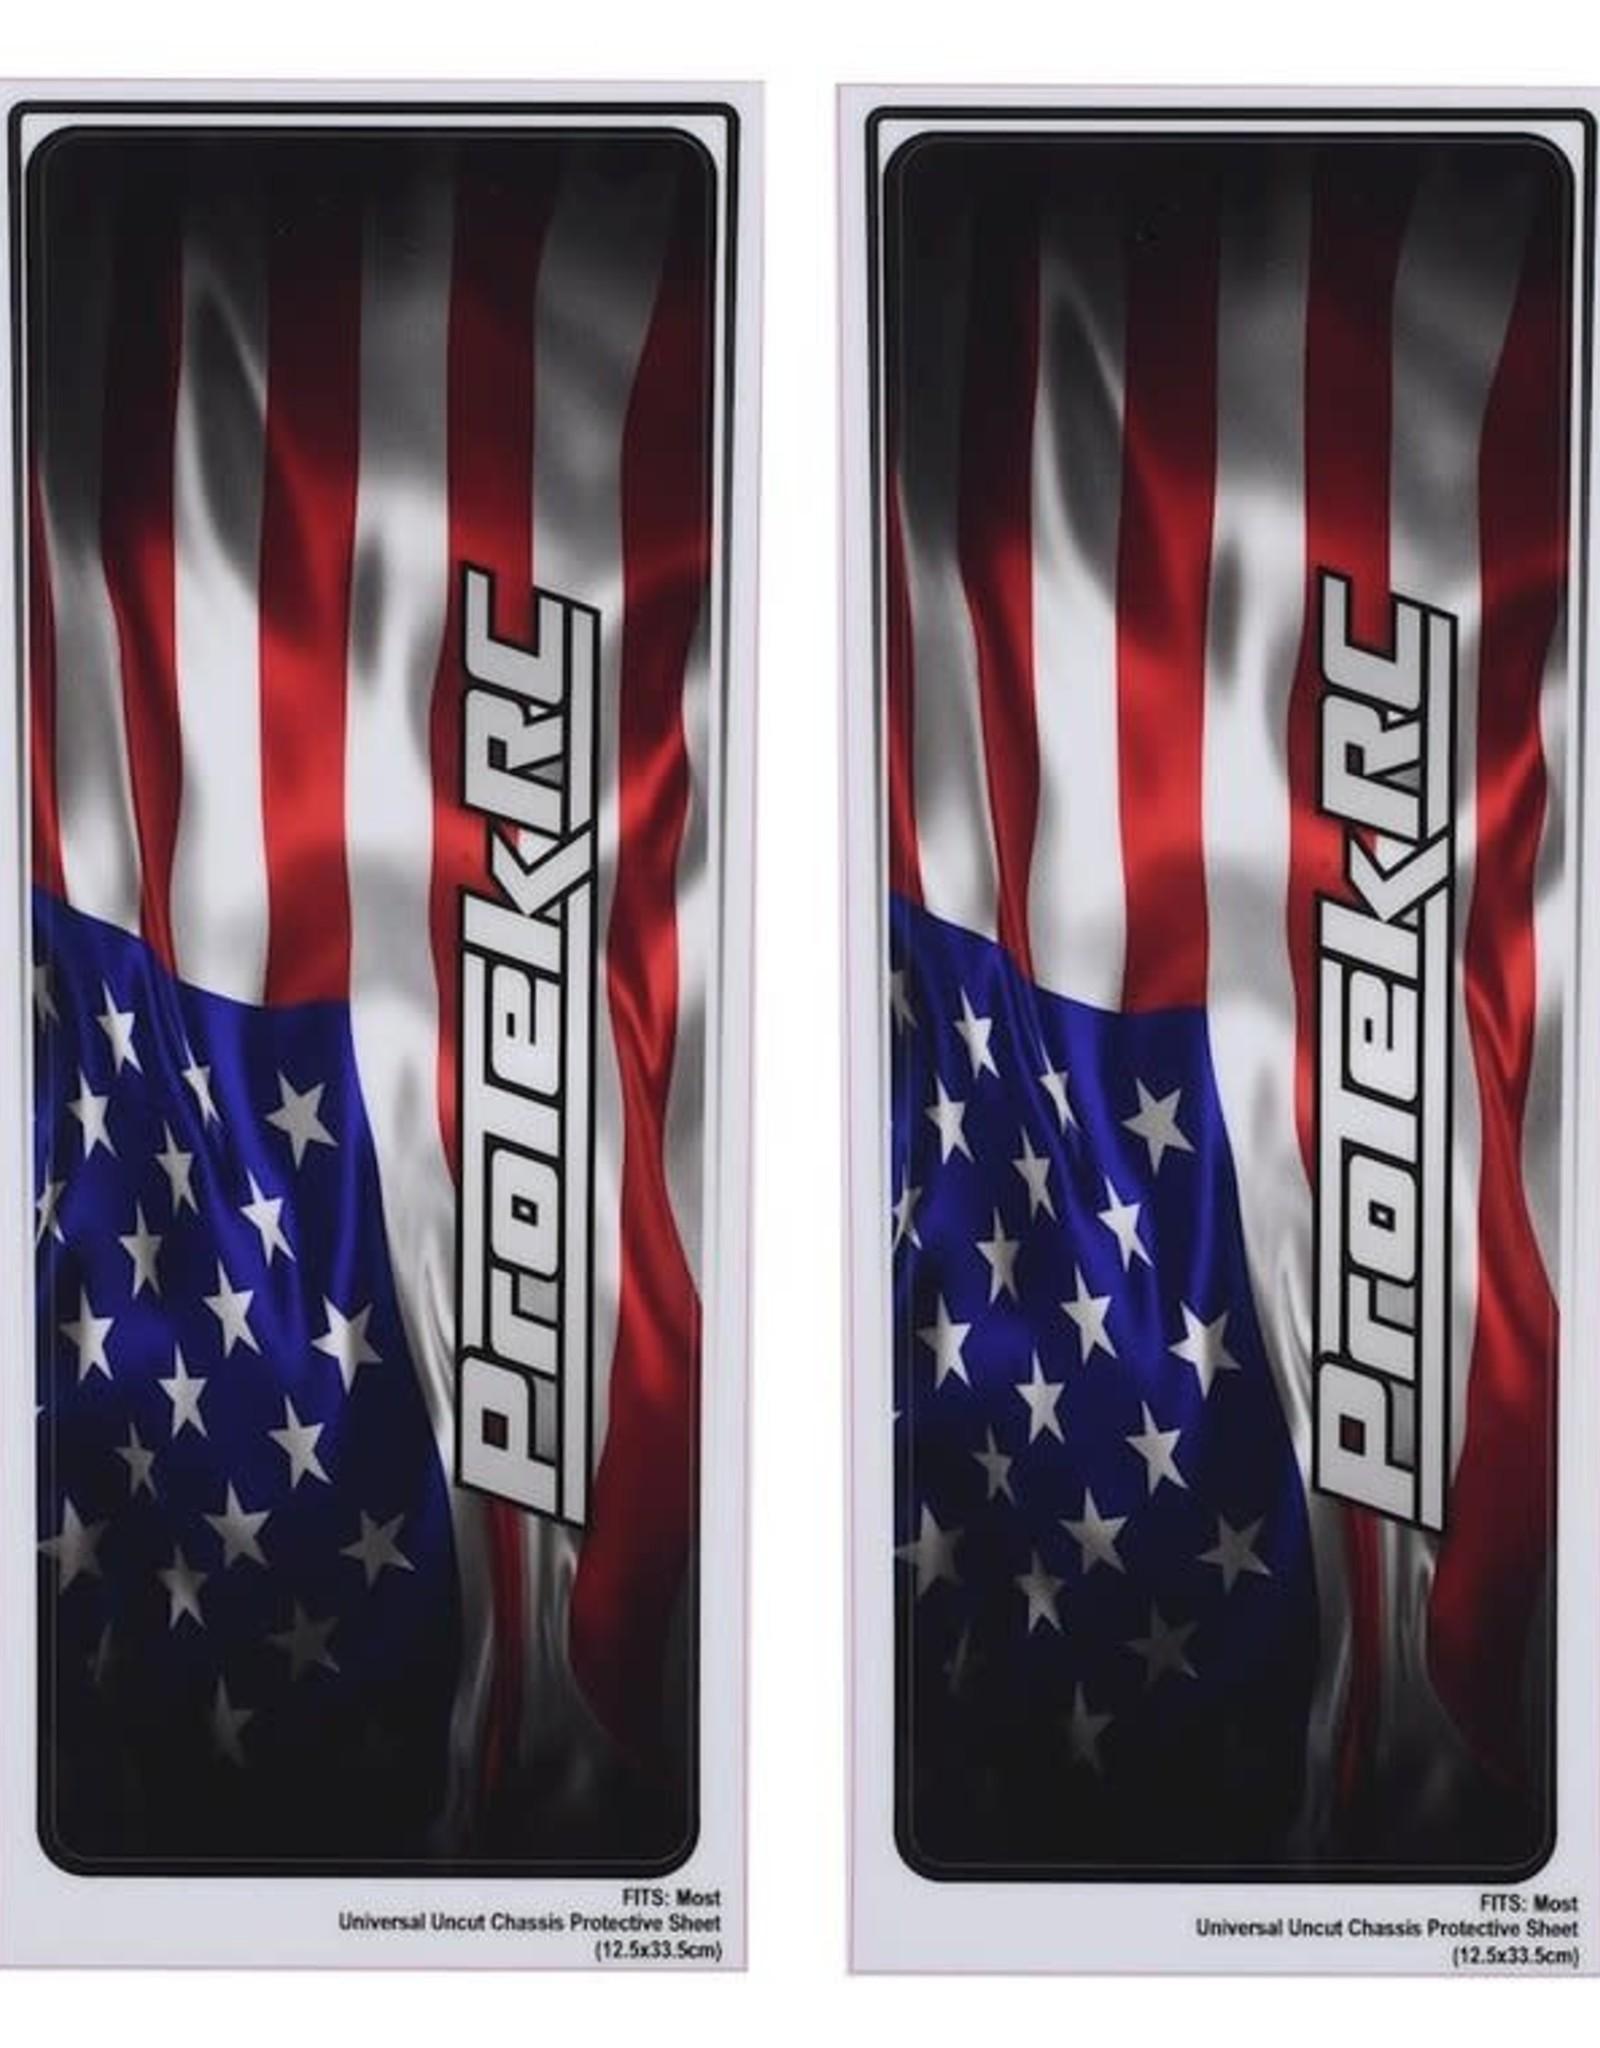 Protek RC ProTek RC Universal Chassis Protective Sheet (USA) (2) (12.5x33.5cm)